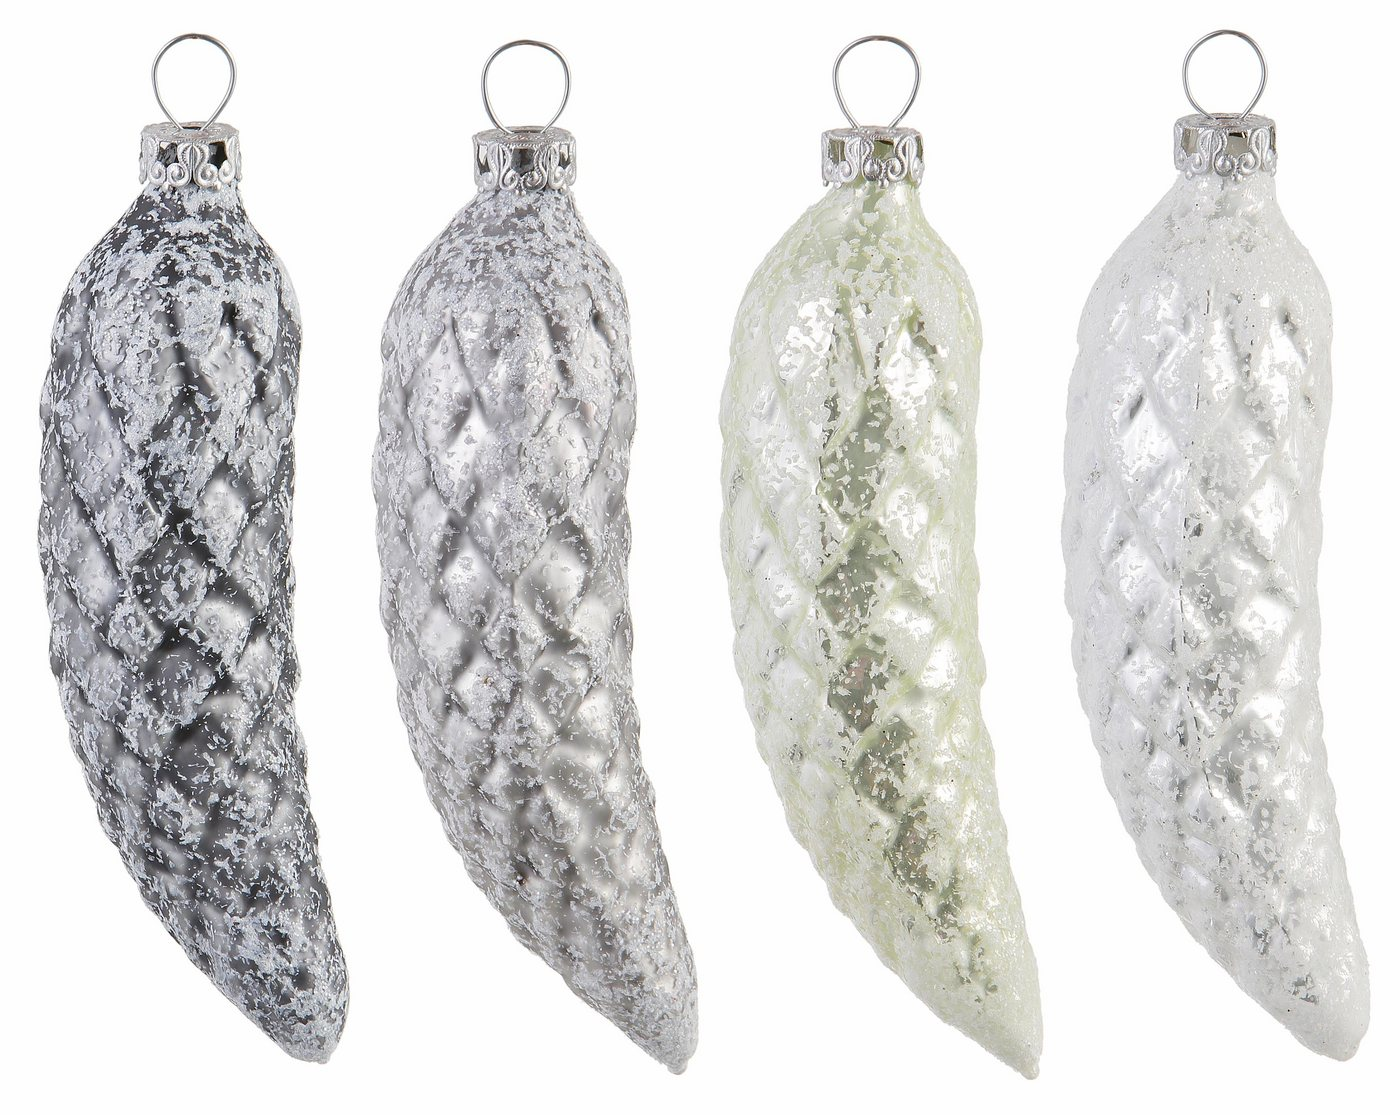 Thüringer Glas TGS-Christbaumschm.Tannenzapfen, Made in Germany, (4tlg.), »Frozen Christmas«